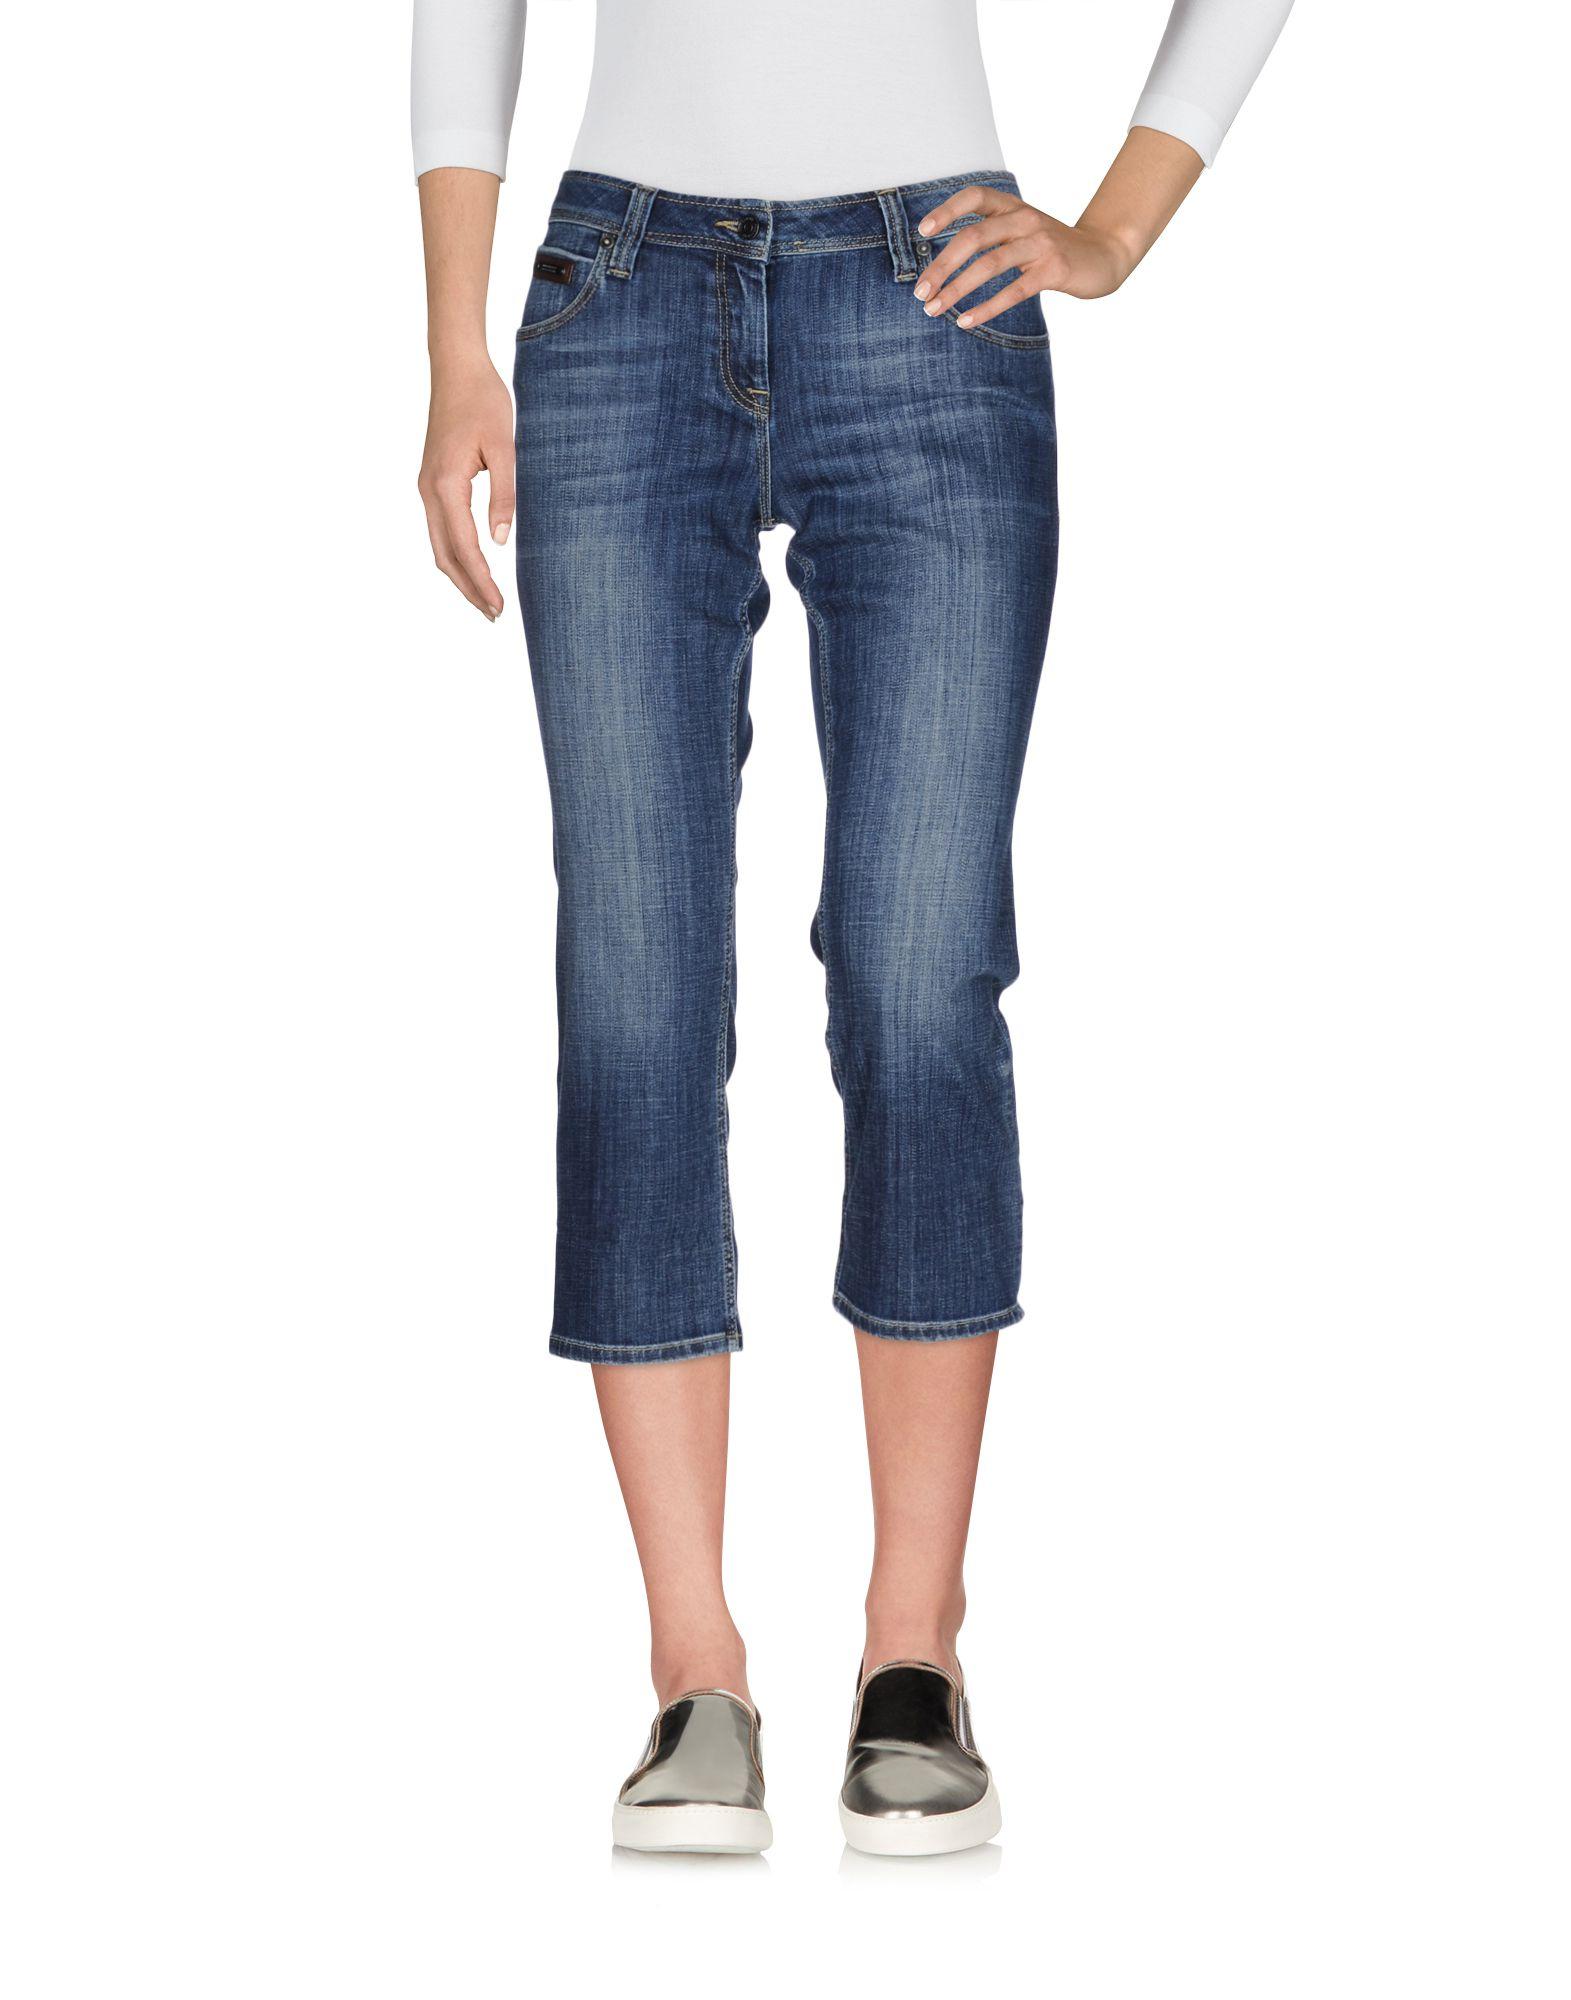 Pantaloni Jeans Burberry Donna - Acquista online su Ty9QCwS0B